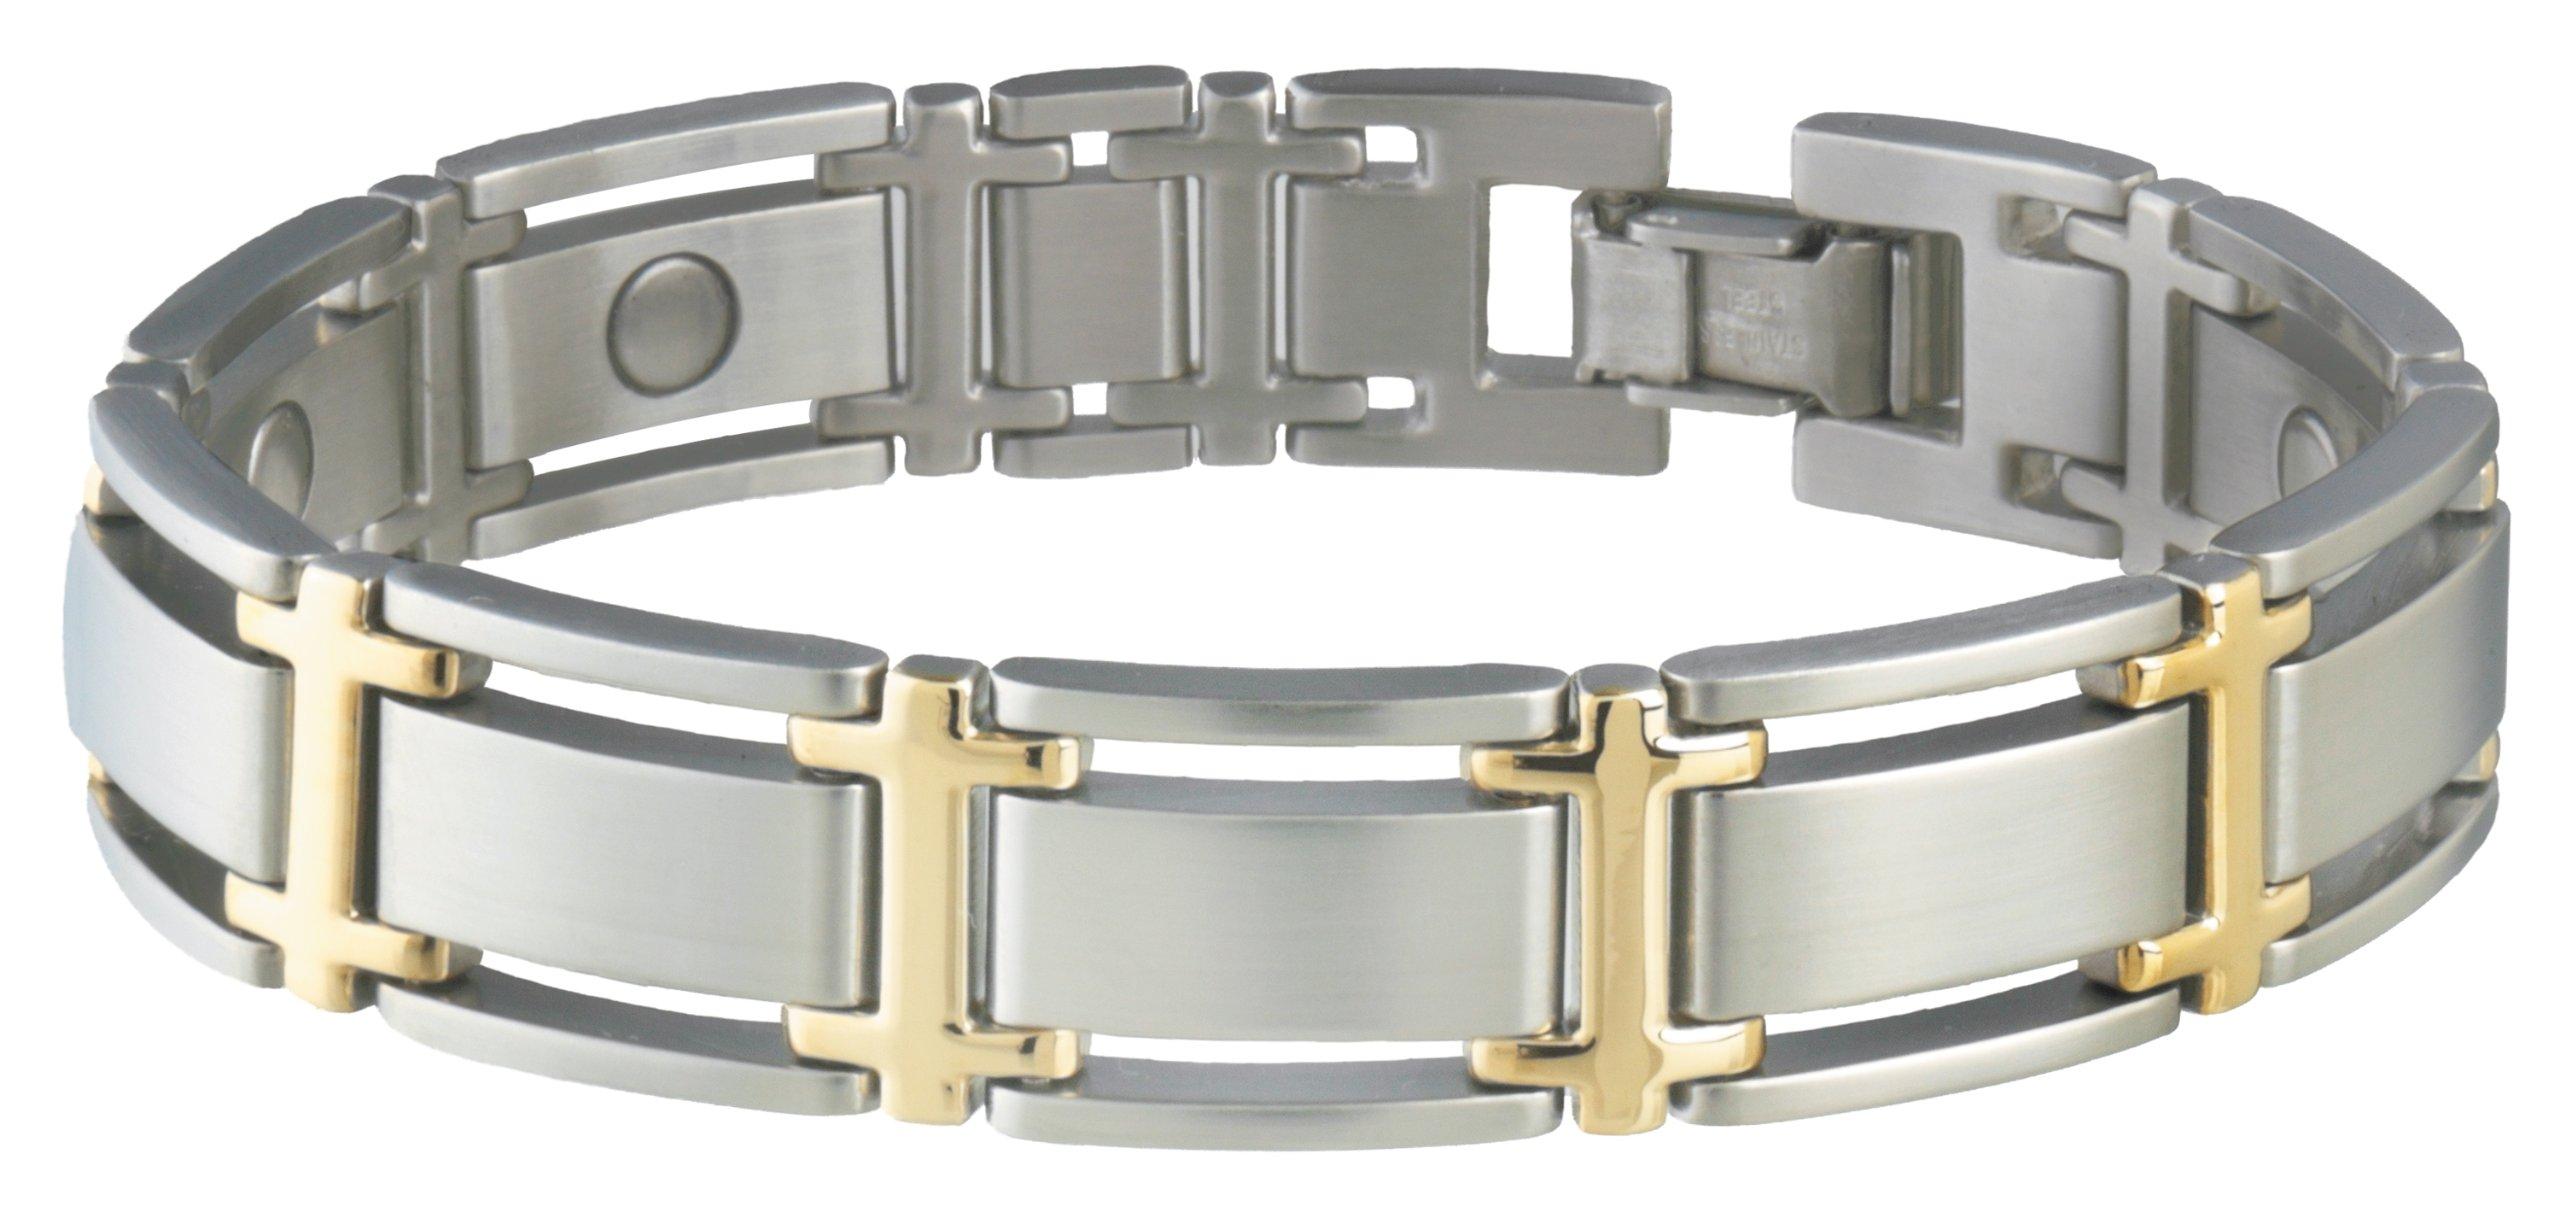 Sabona Executive Symmetry Duet Magnetic Bracelet - Large by Sabona (Image #1)